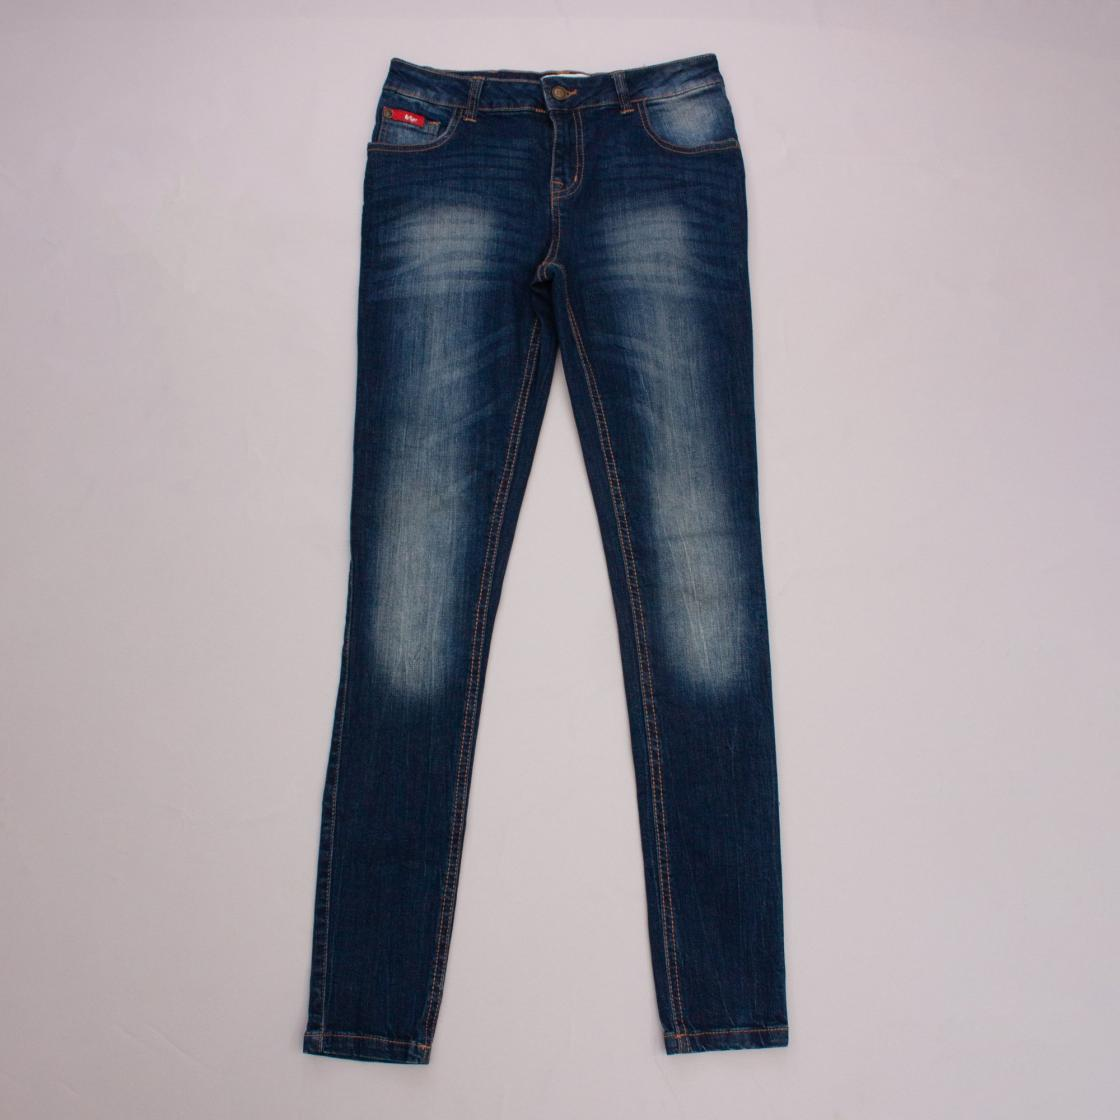 Lee Cooper Denim Jeans